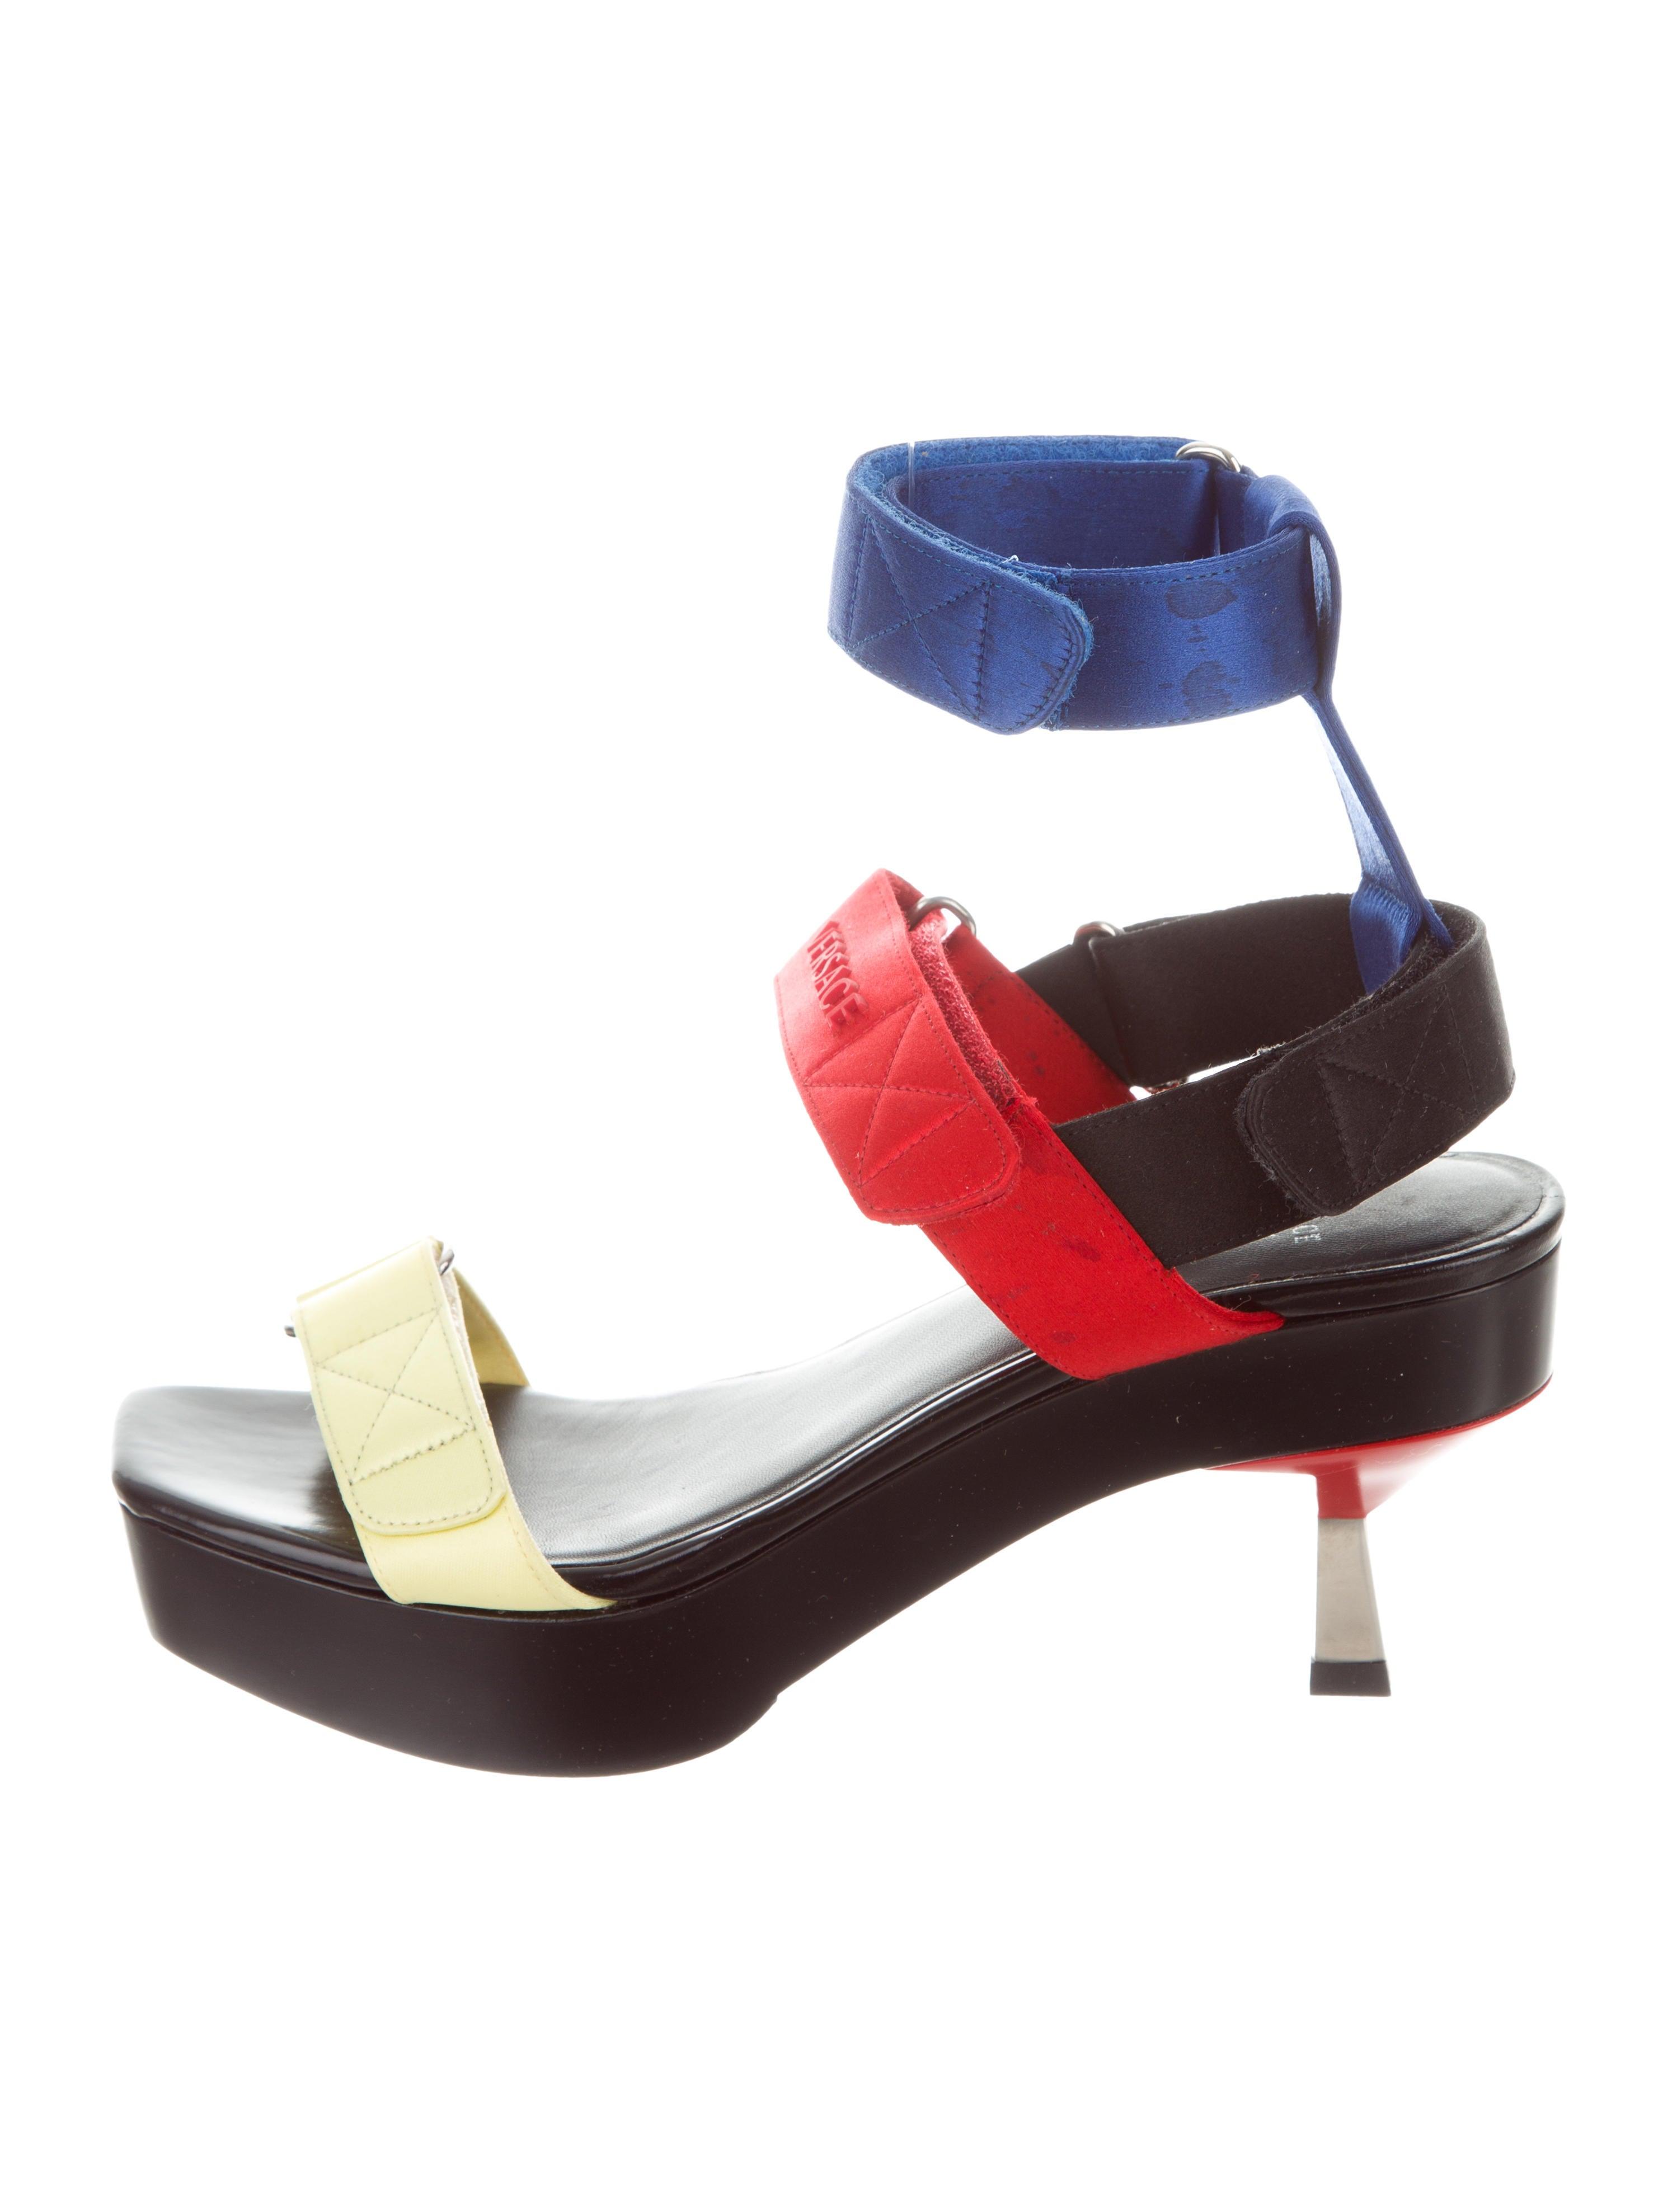 Versace Satin Multstrap Sandals professional choice cheap online discount new arrival vYU4b